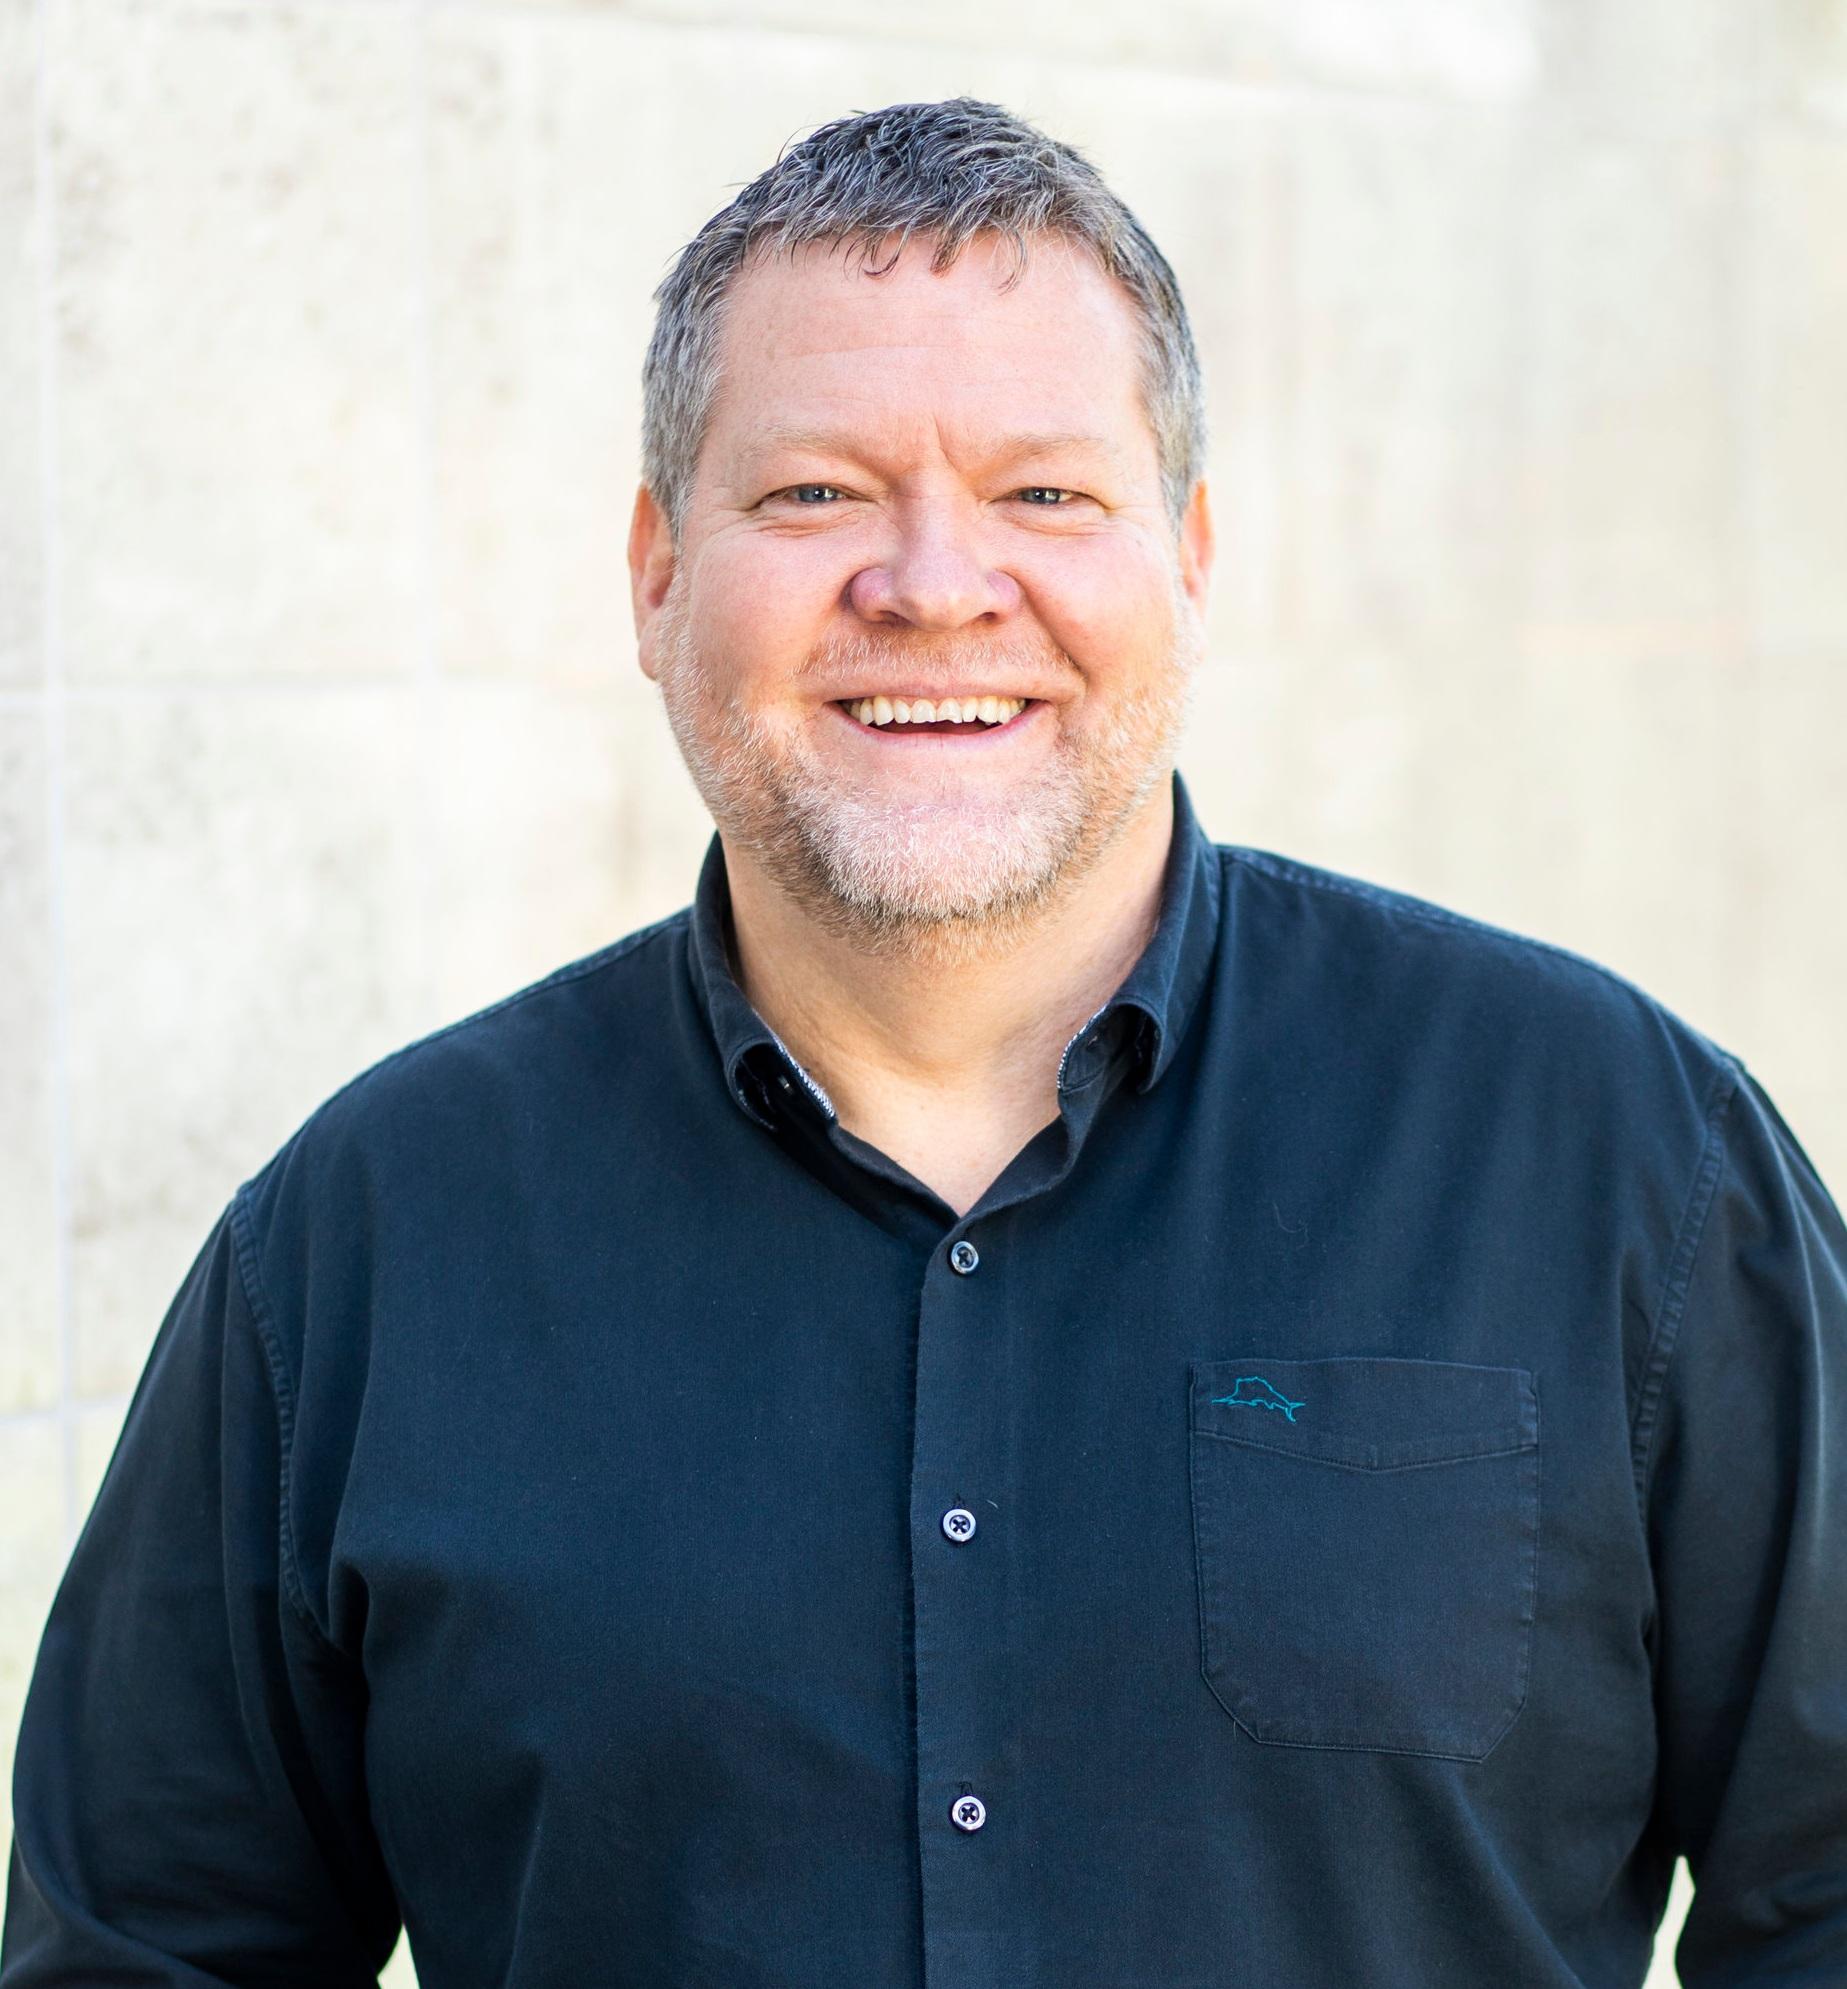 La Habra   Wednesday 6:30PM   Brian Wilson, House Church Pastor